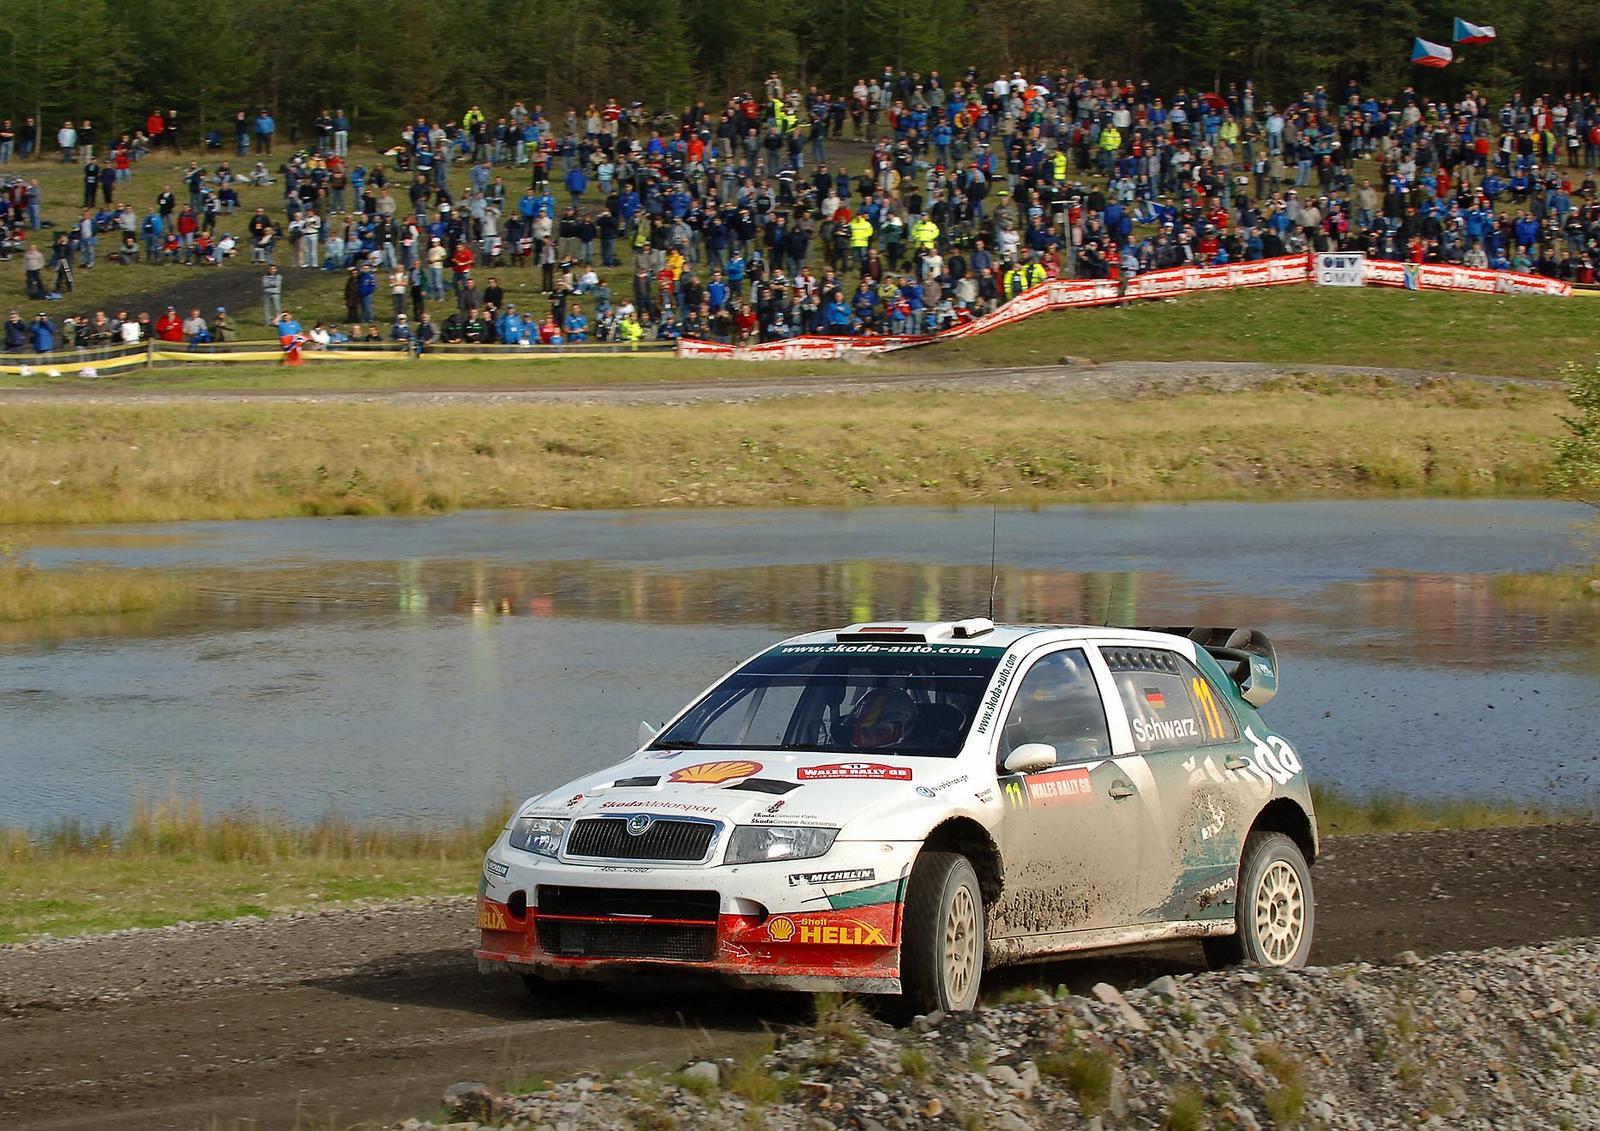 Skoda-Fabia_WRC_mp49_pic_28930.jpg